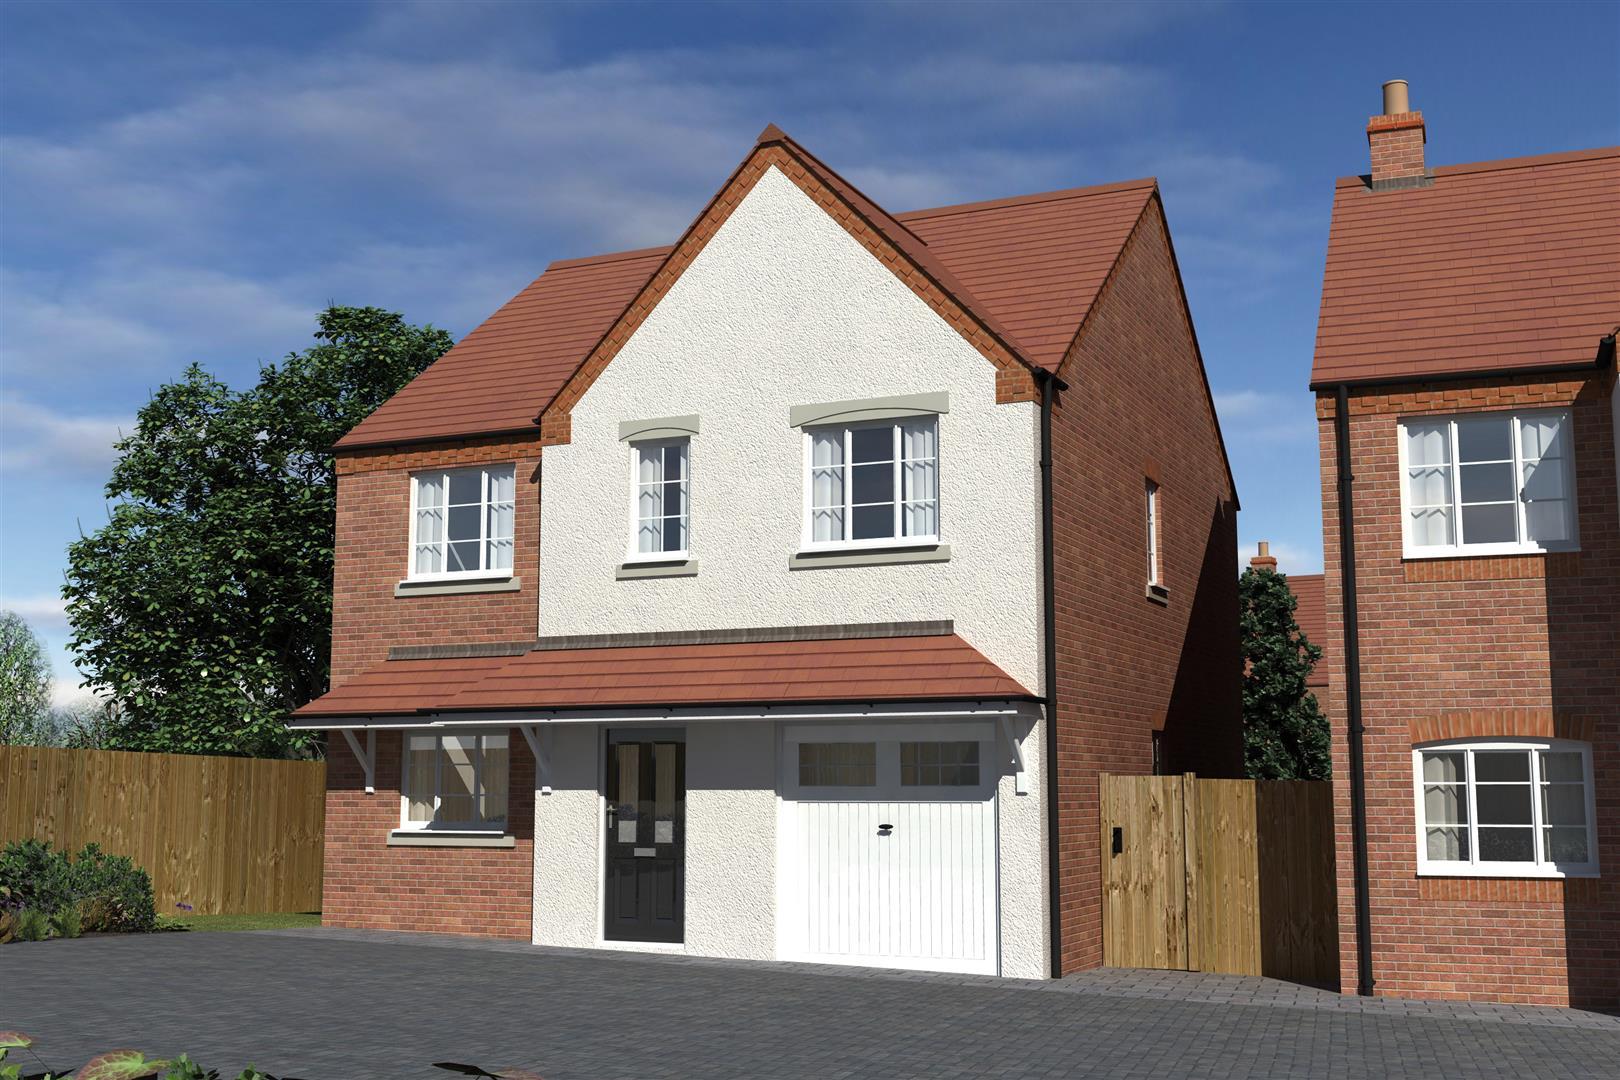 4 Bedrooms House for sale in Sherbourne Gardens, Bridgenorth Road, Highley